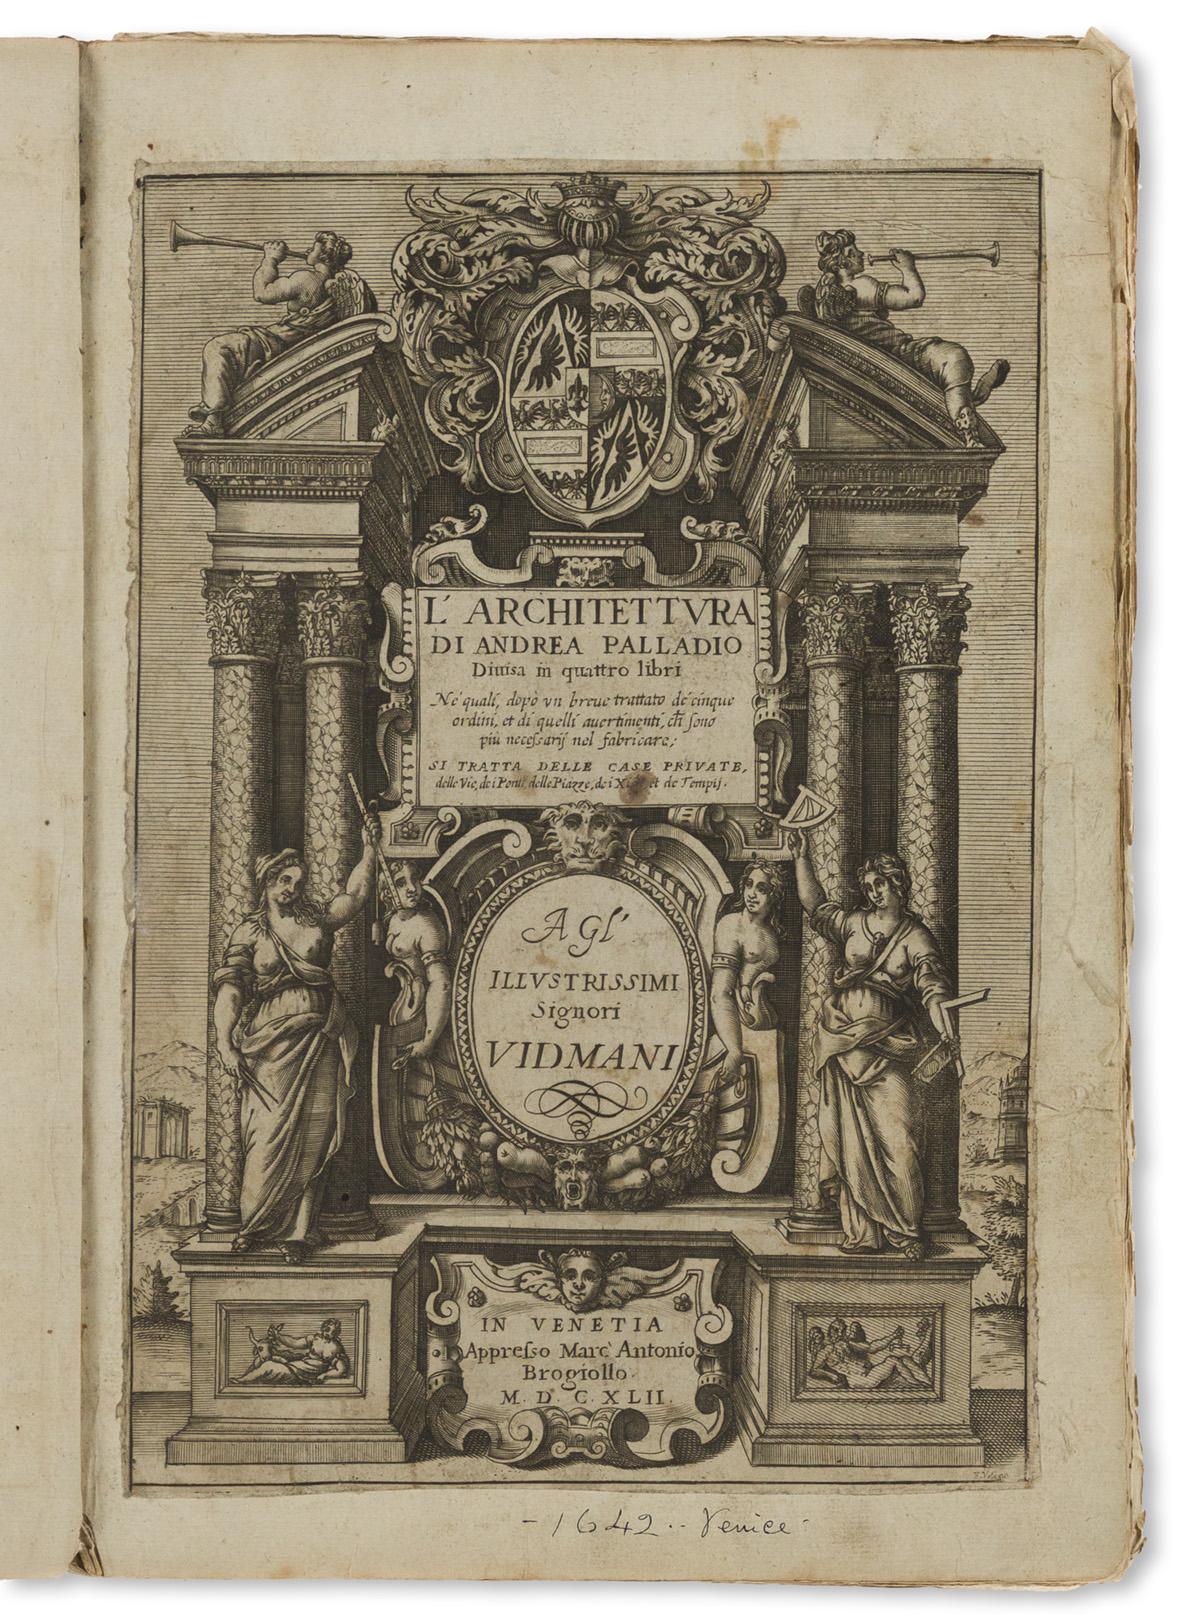 Palladio, Andrea (1518-1580) LArchitettura Divisa in Quattro Libri.